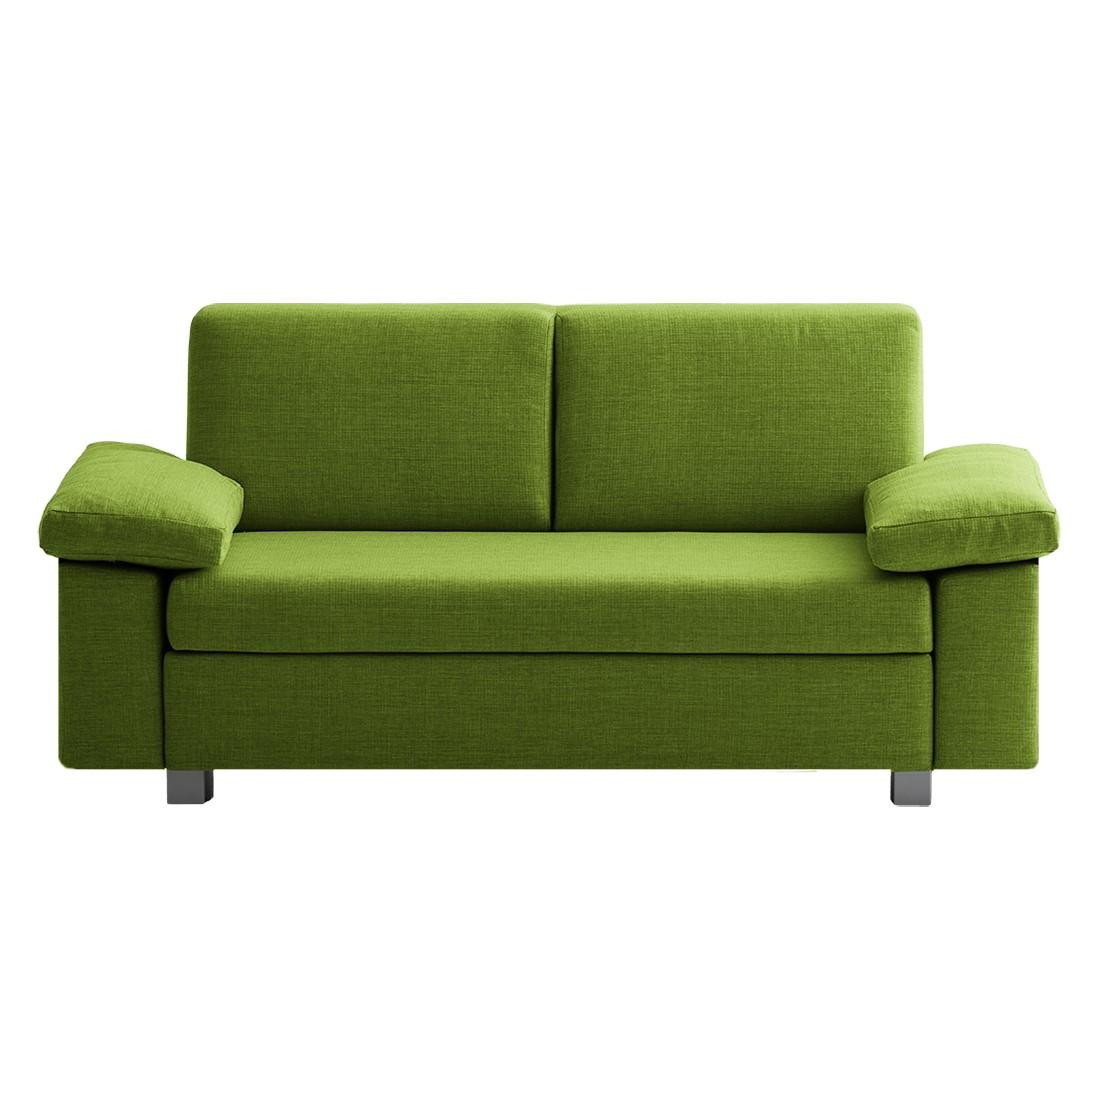 Slaapbank Plaza - geweven stof - Groen - 192cm - Opklapbare armleuningen, chillout by Franz Fertig